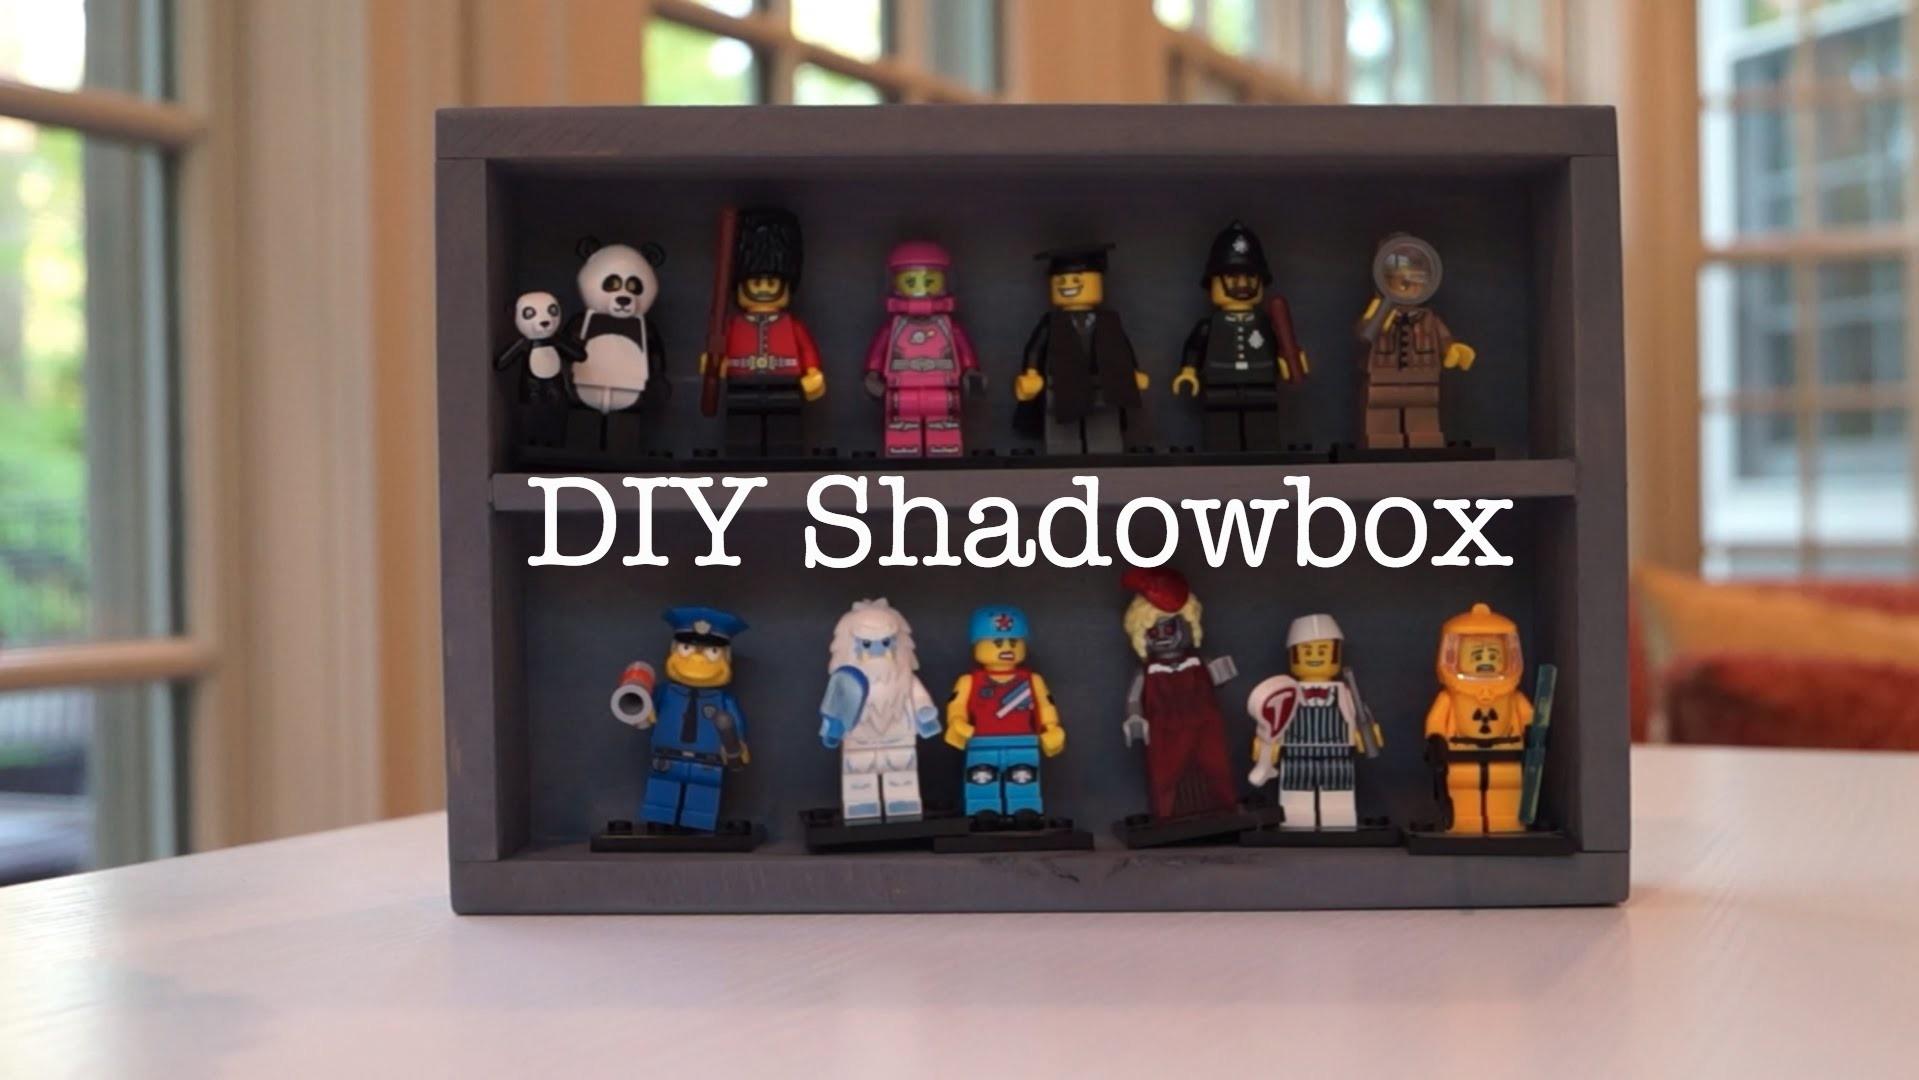 DIY Shadowbox